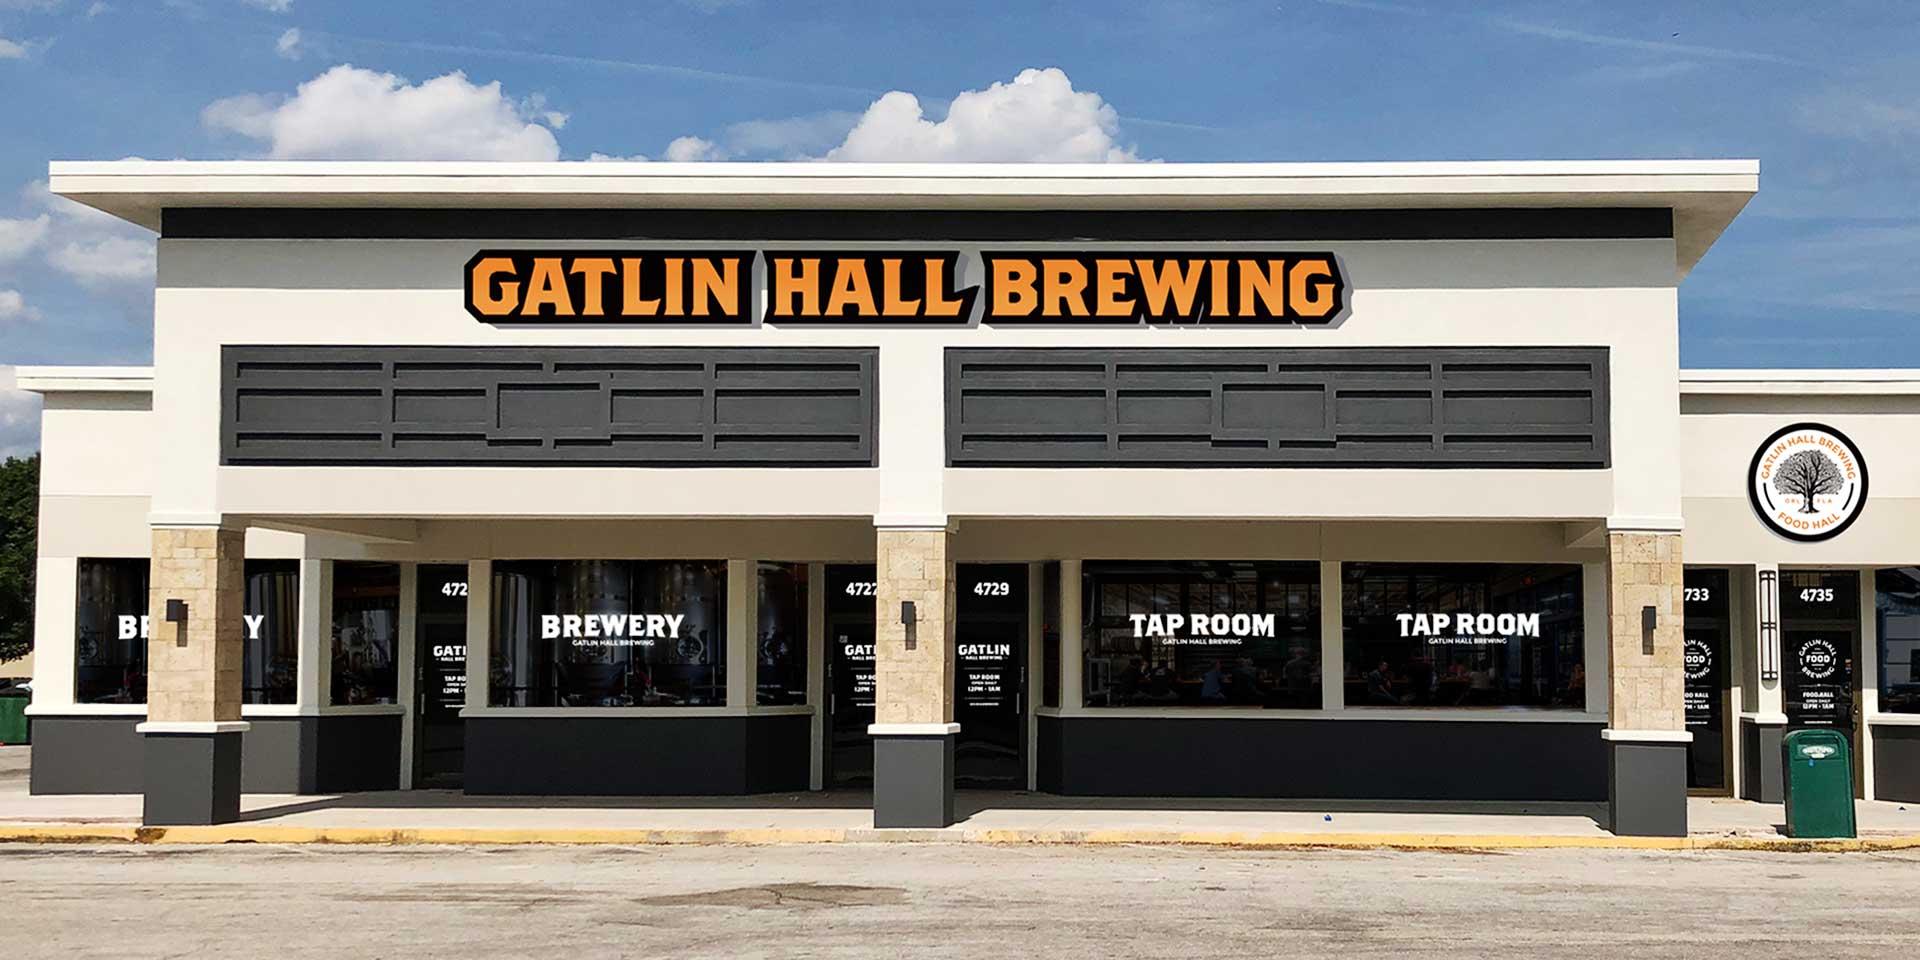 Exterior of Gatlin Hall Brewery location